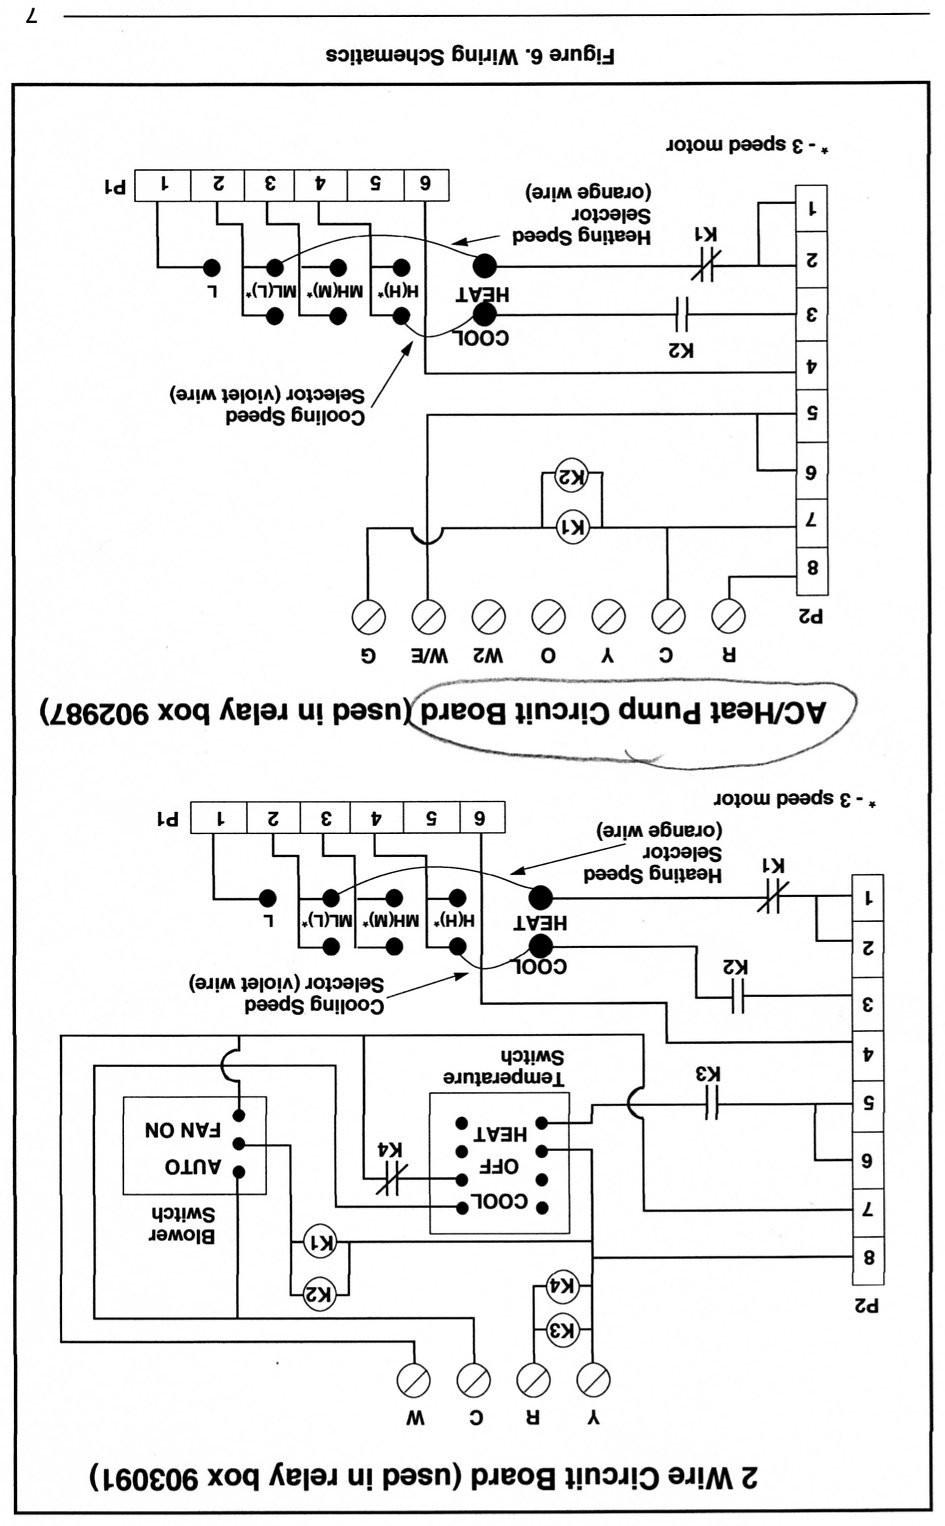 medium resolution of nordyne thermostat wiring diagram wiring diagrams lol nordyne 903992 thermostat wiring diagram nordyne heat pump wiring diagram thermostat